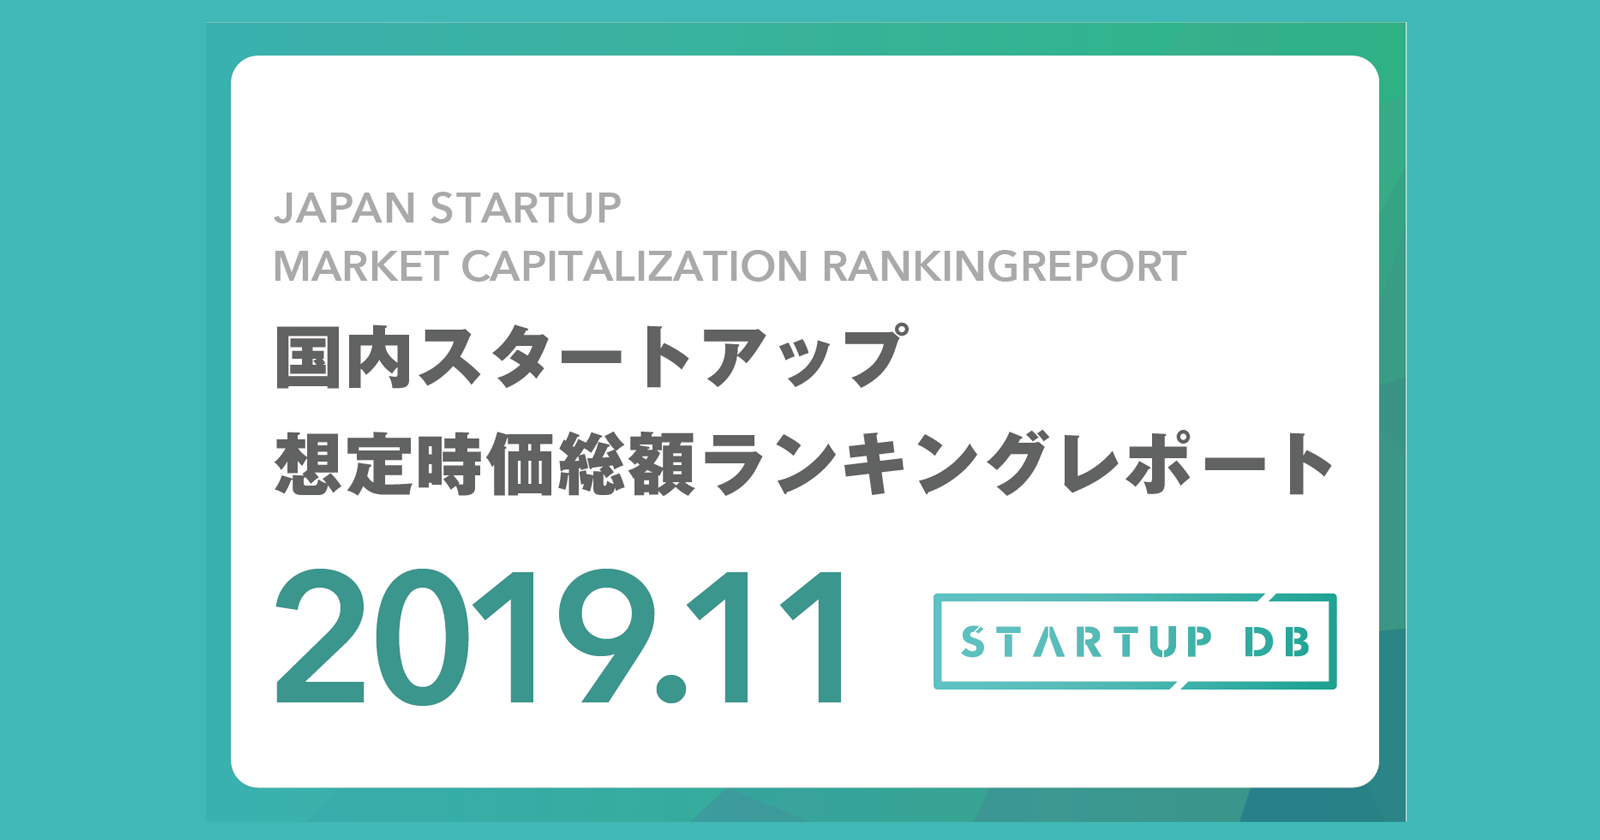 【STARTUP DB】調査結果 国内スタートアップ想定時価総額ランキング2019年11月 TBMがユニコーンに仲間入り。国内6社目。